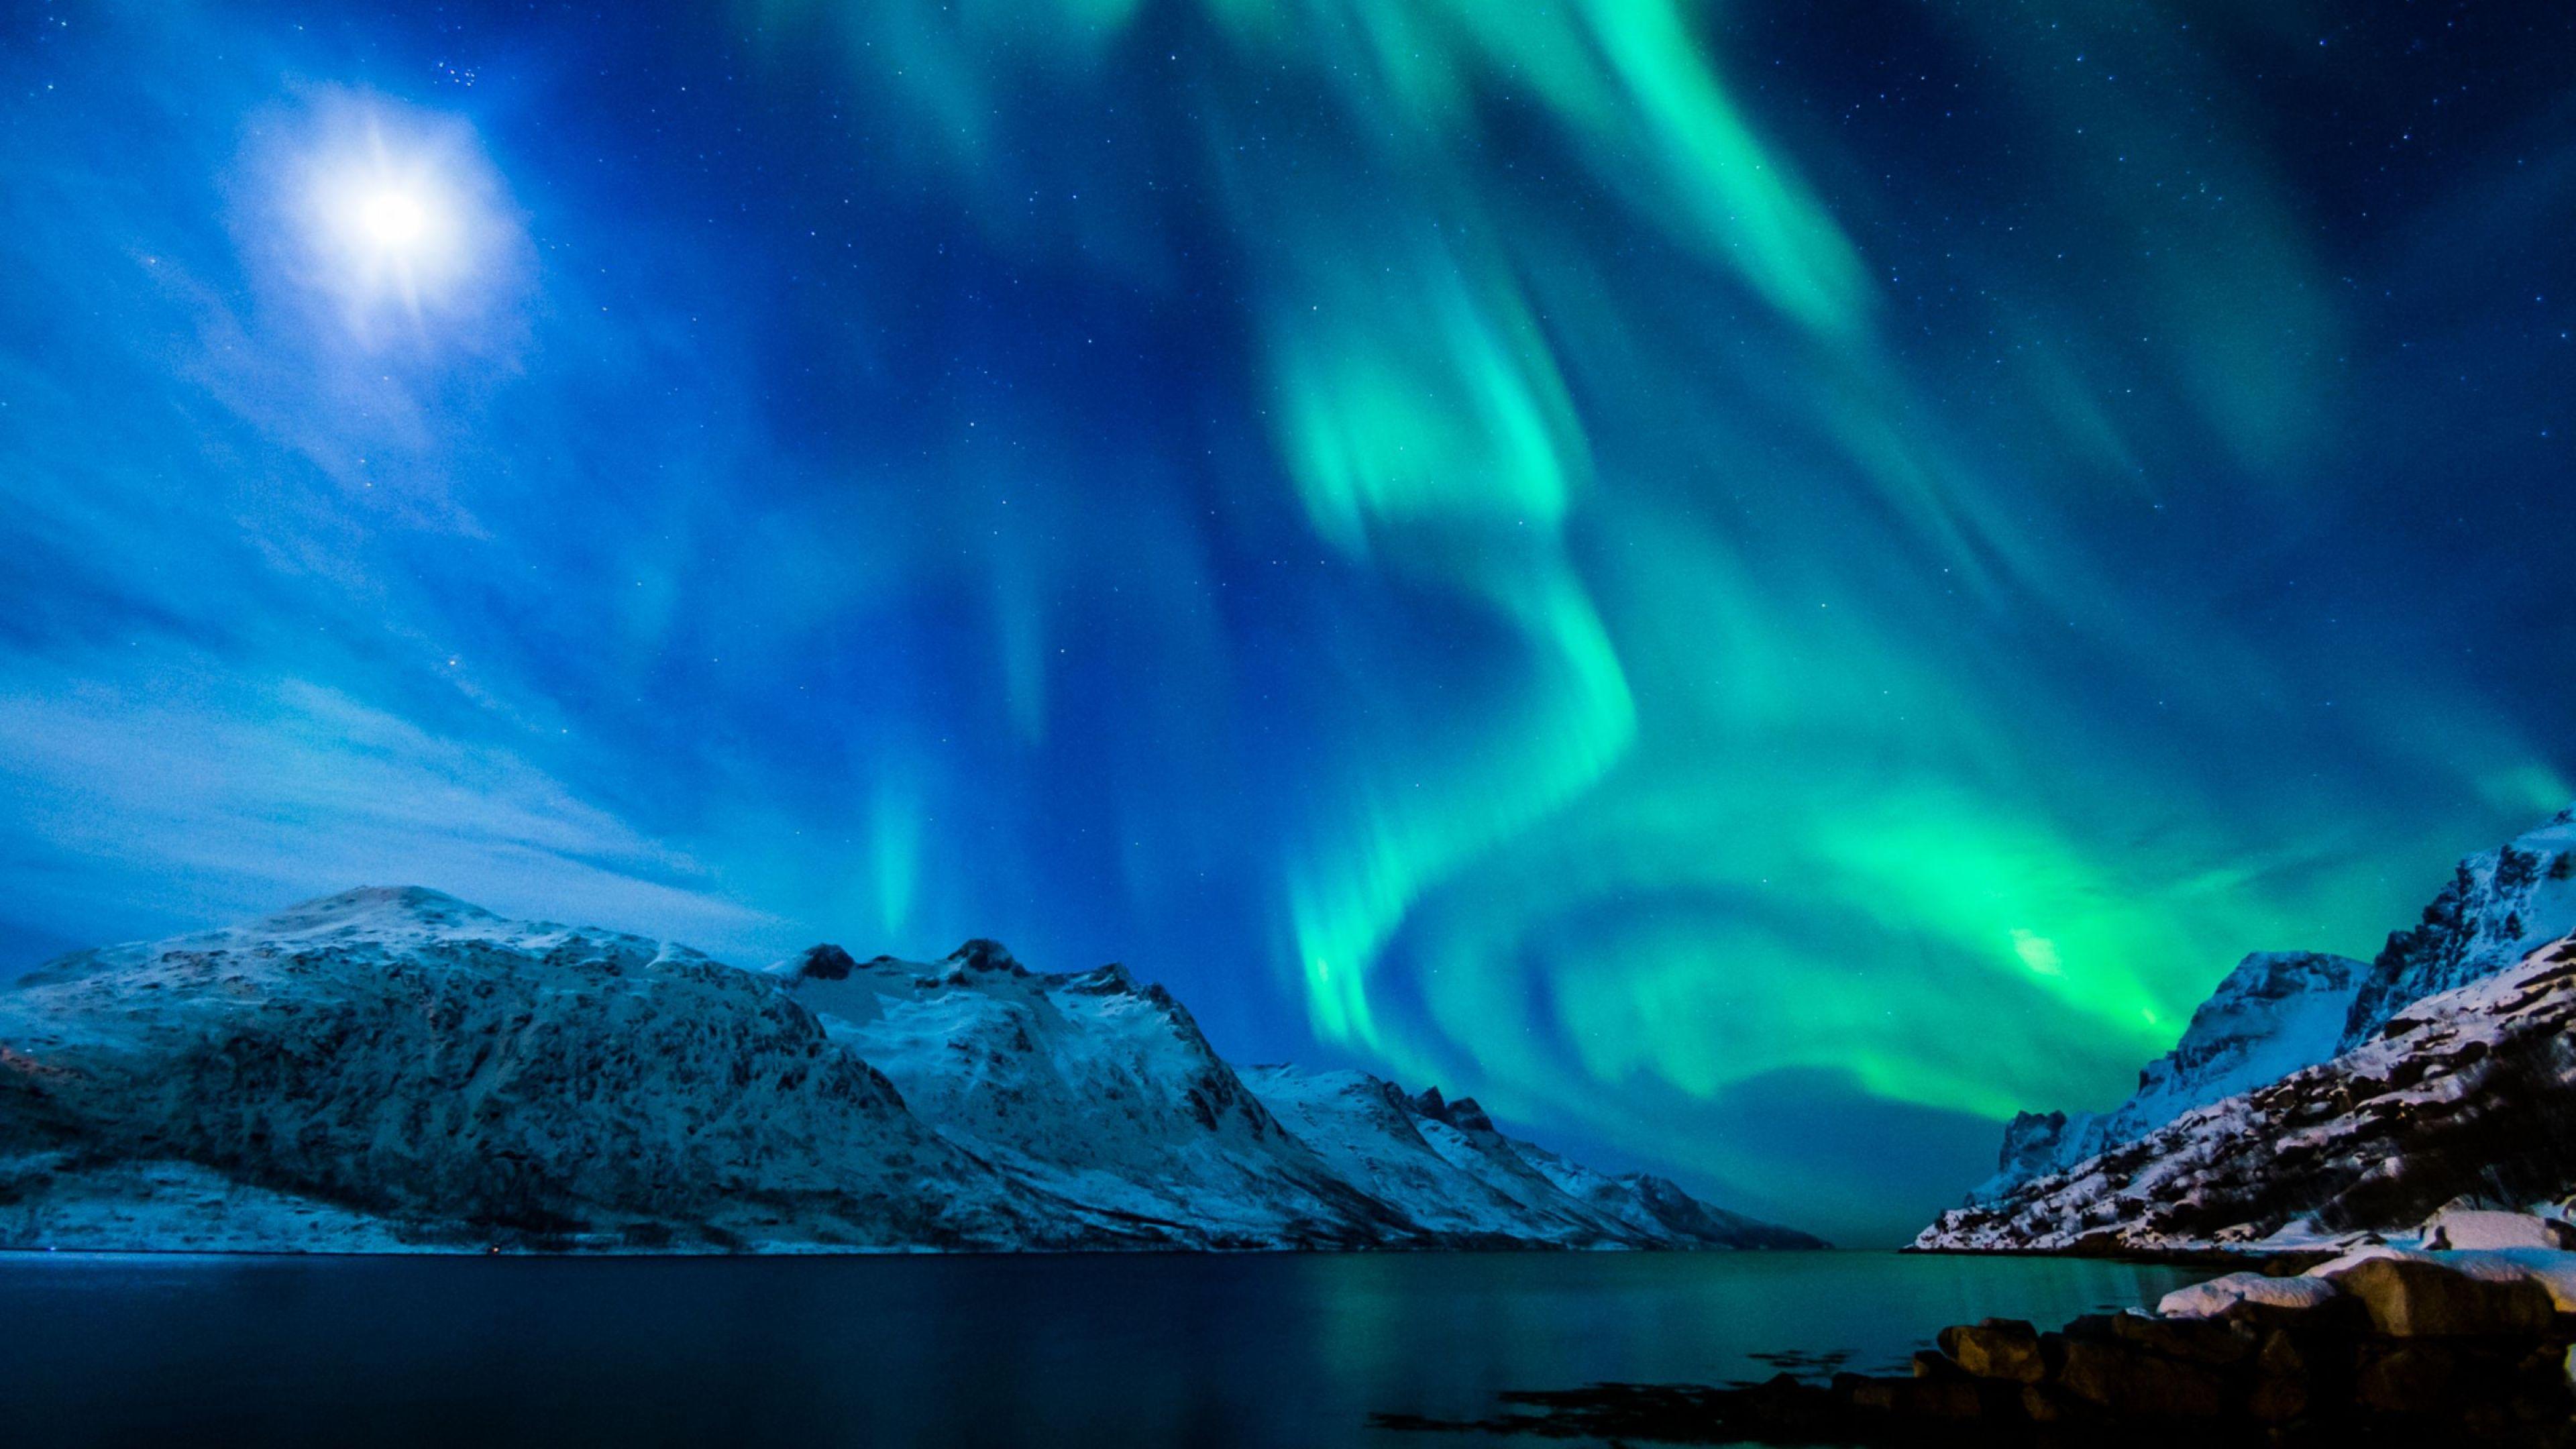 Fisheye Aurora Borealis 4K Ultra HD Wallpaper